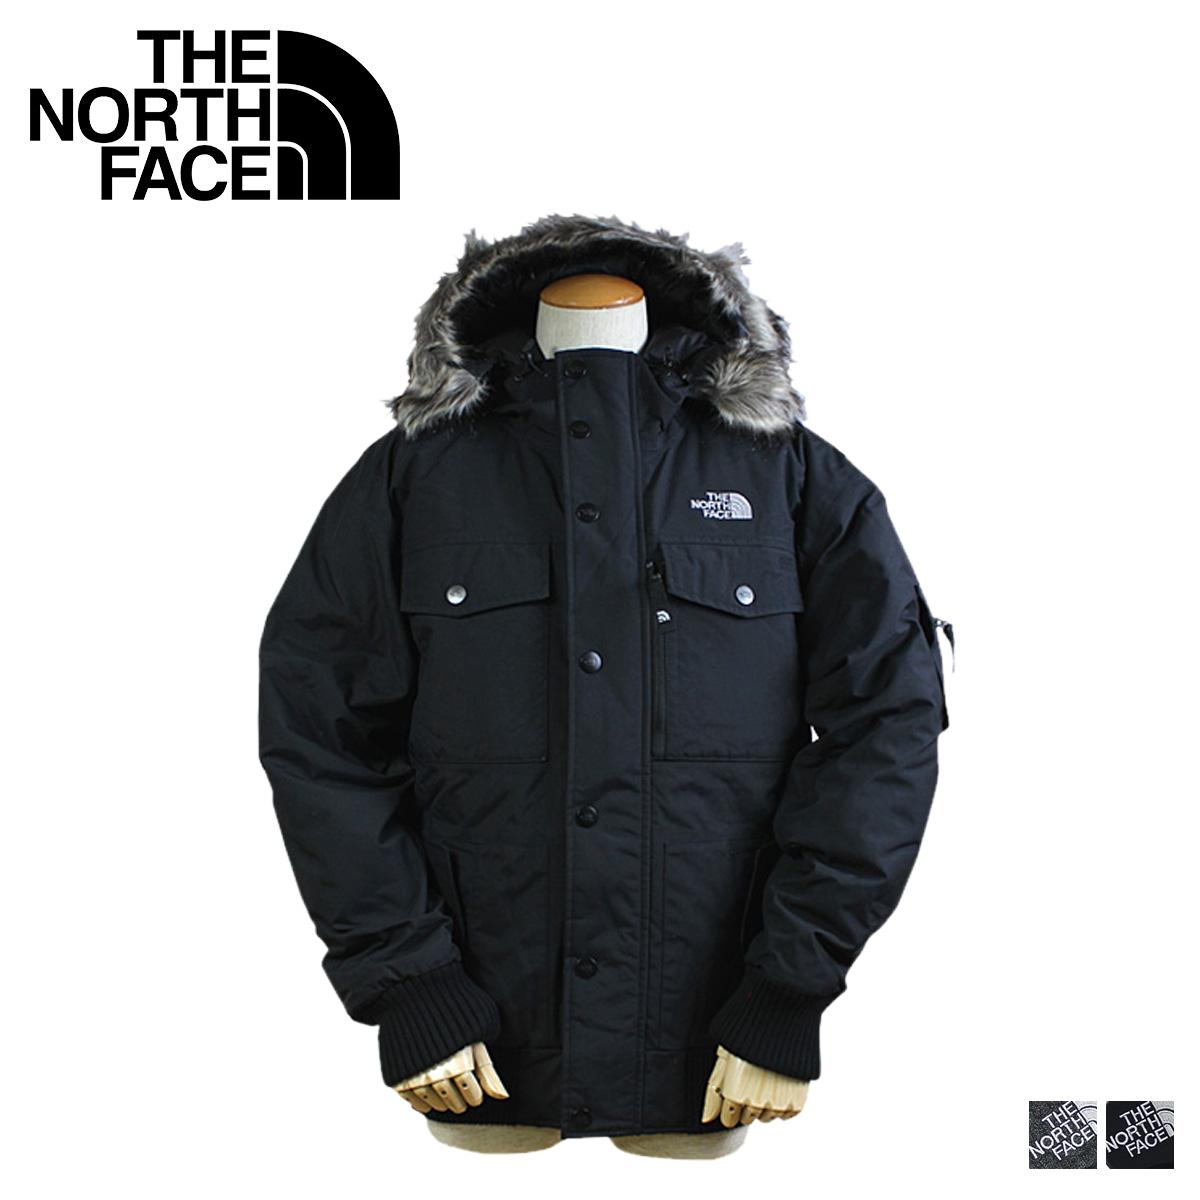 27a46af14238 ... reduced sold out the north face zip up jacket black gray a8xc gotham  jacket men 362da